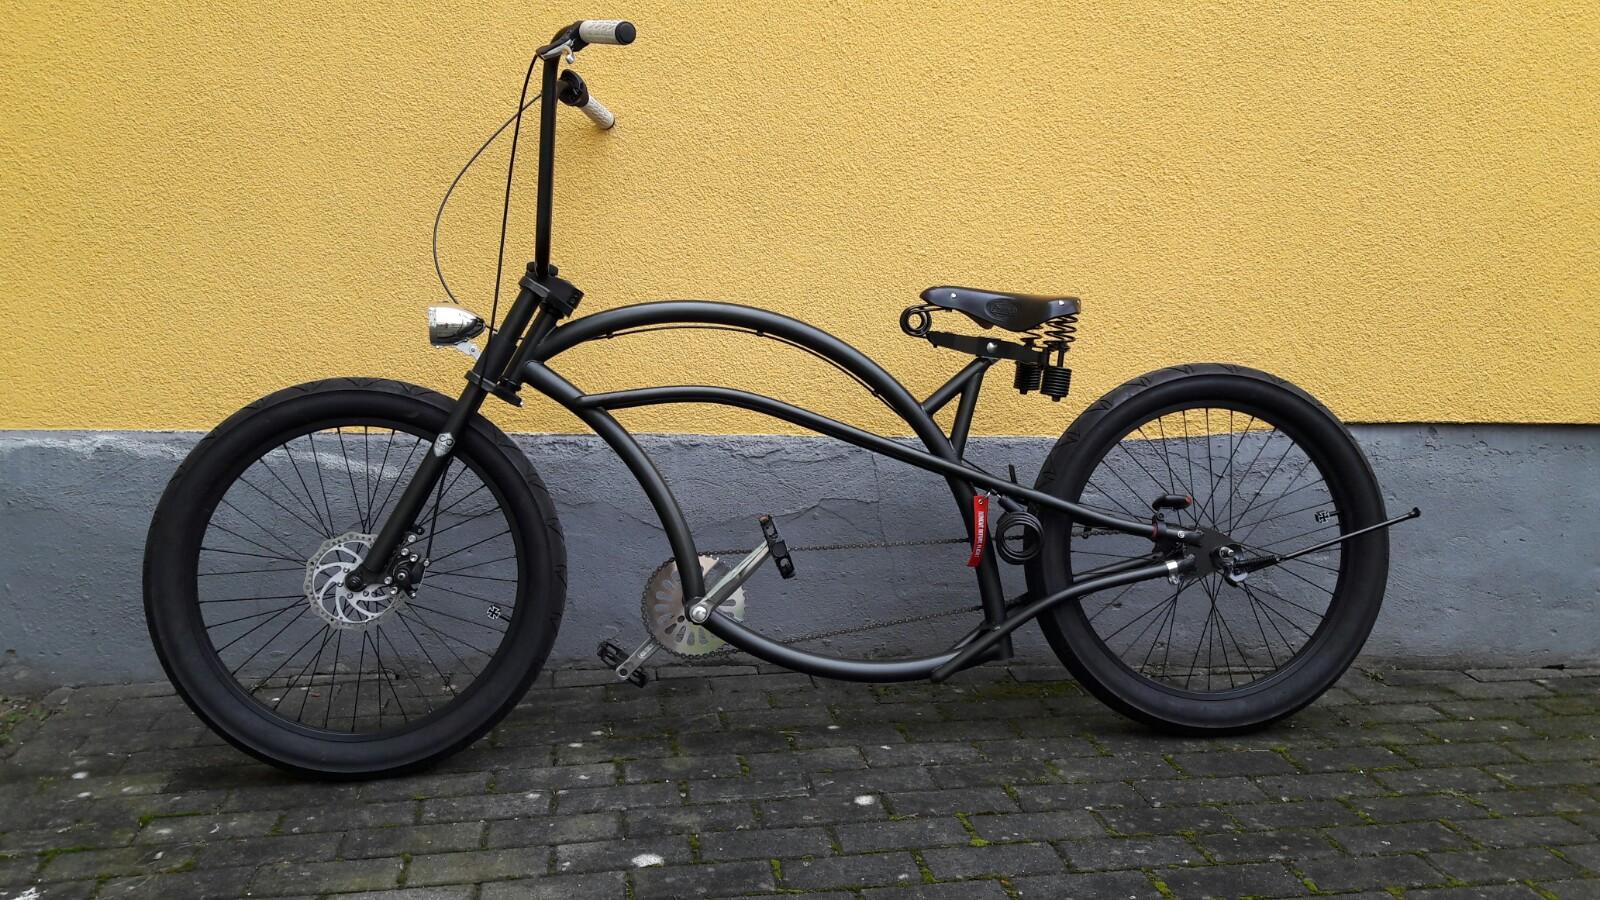 BONANZA Guidon//Vélo Guidon Noir